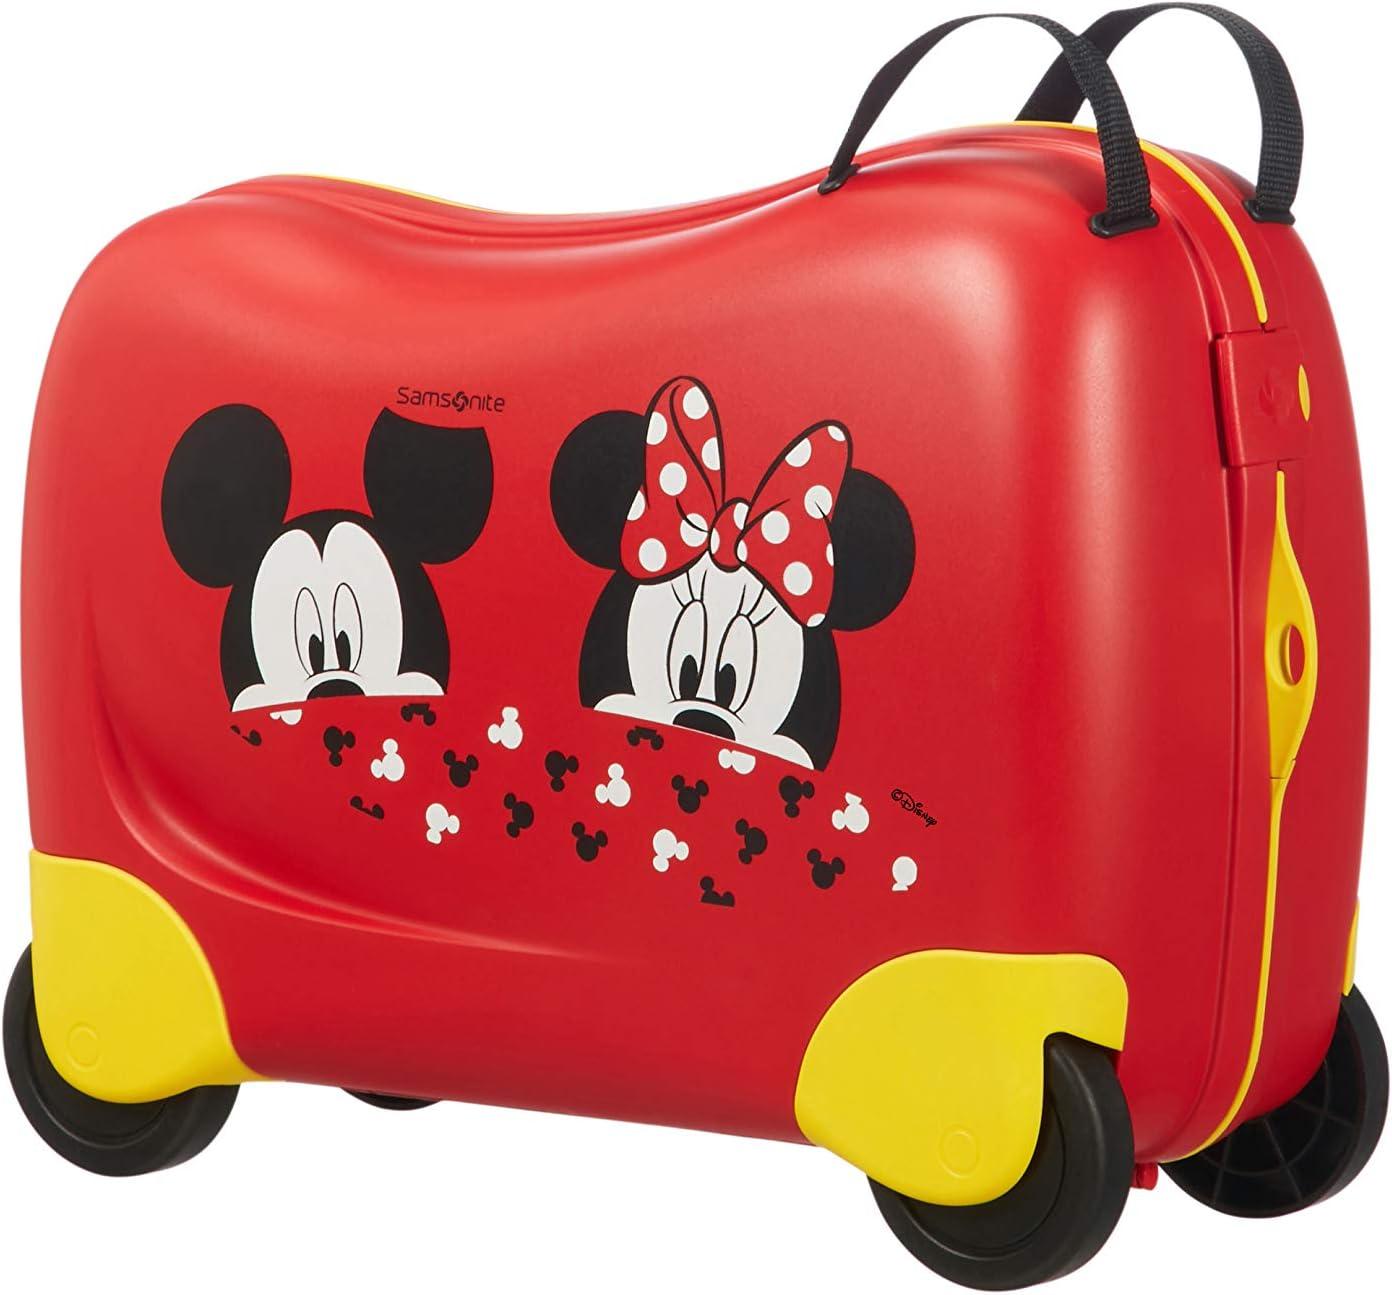 Samsonite Dream Rider Disney - Maleta Infantil, 51 cm, 28 L, Rojo (Mickey/Minnie Peeking)